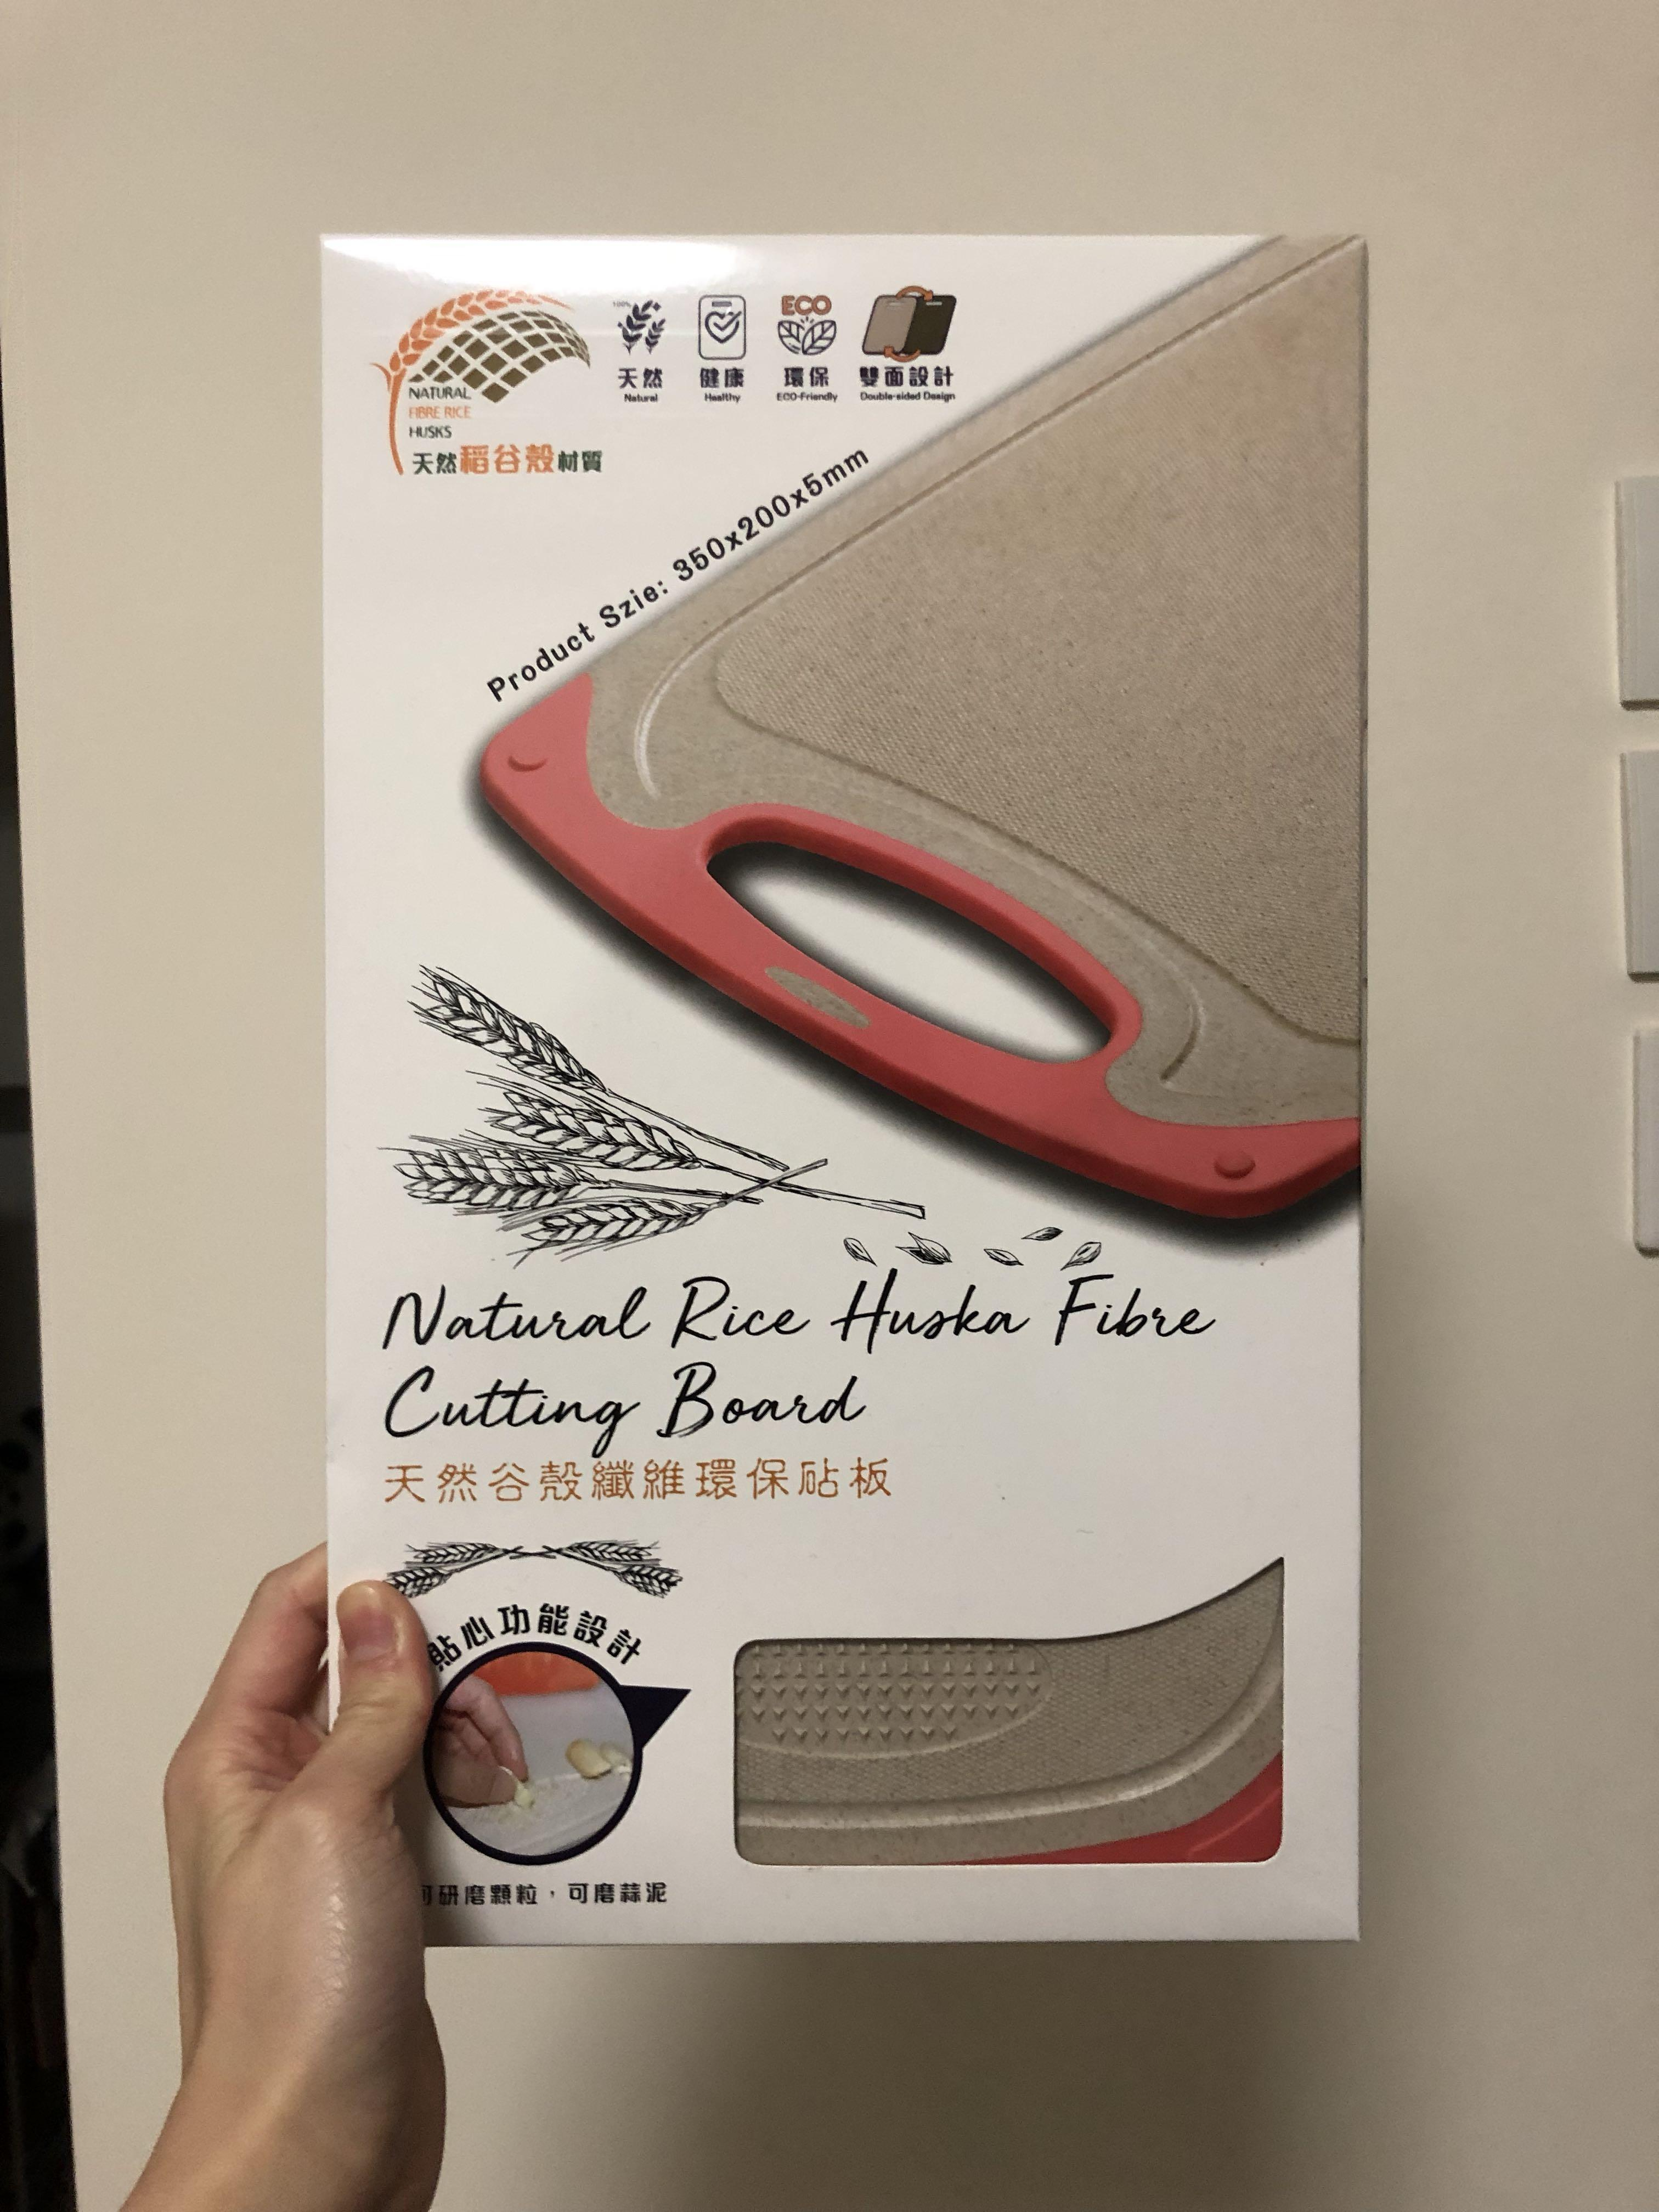 天然谷殼纖維環保砧板 Natural Rice Huska Fibre Cutting Board